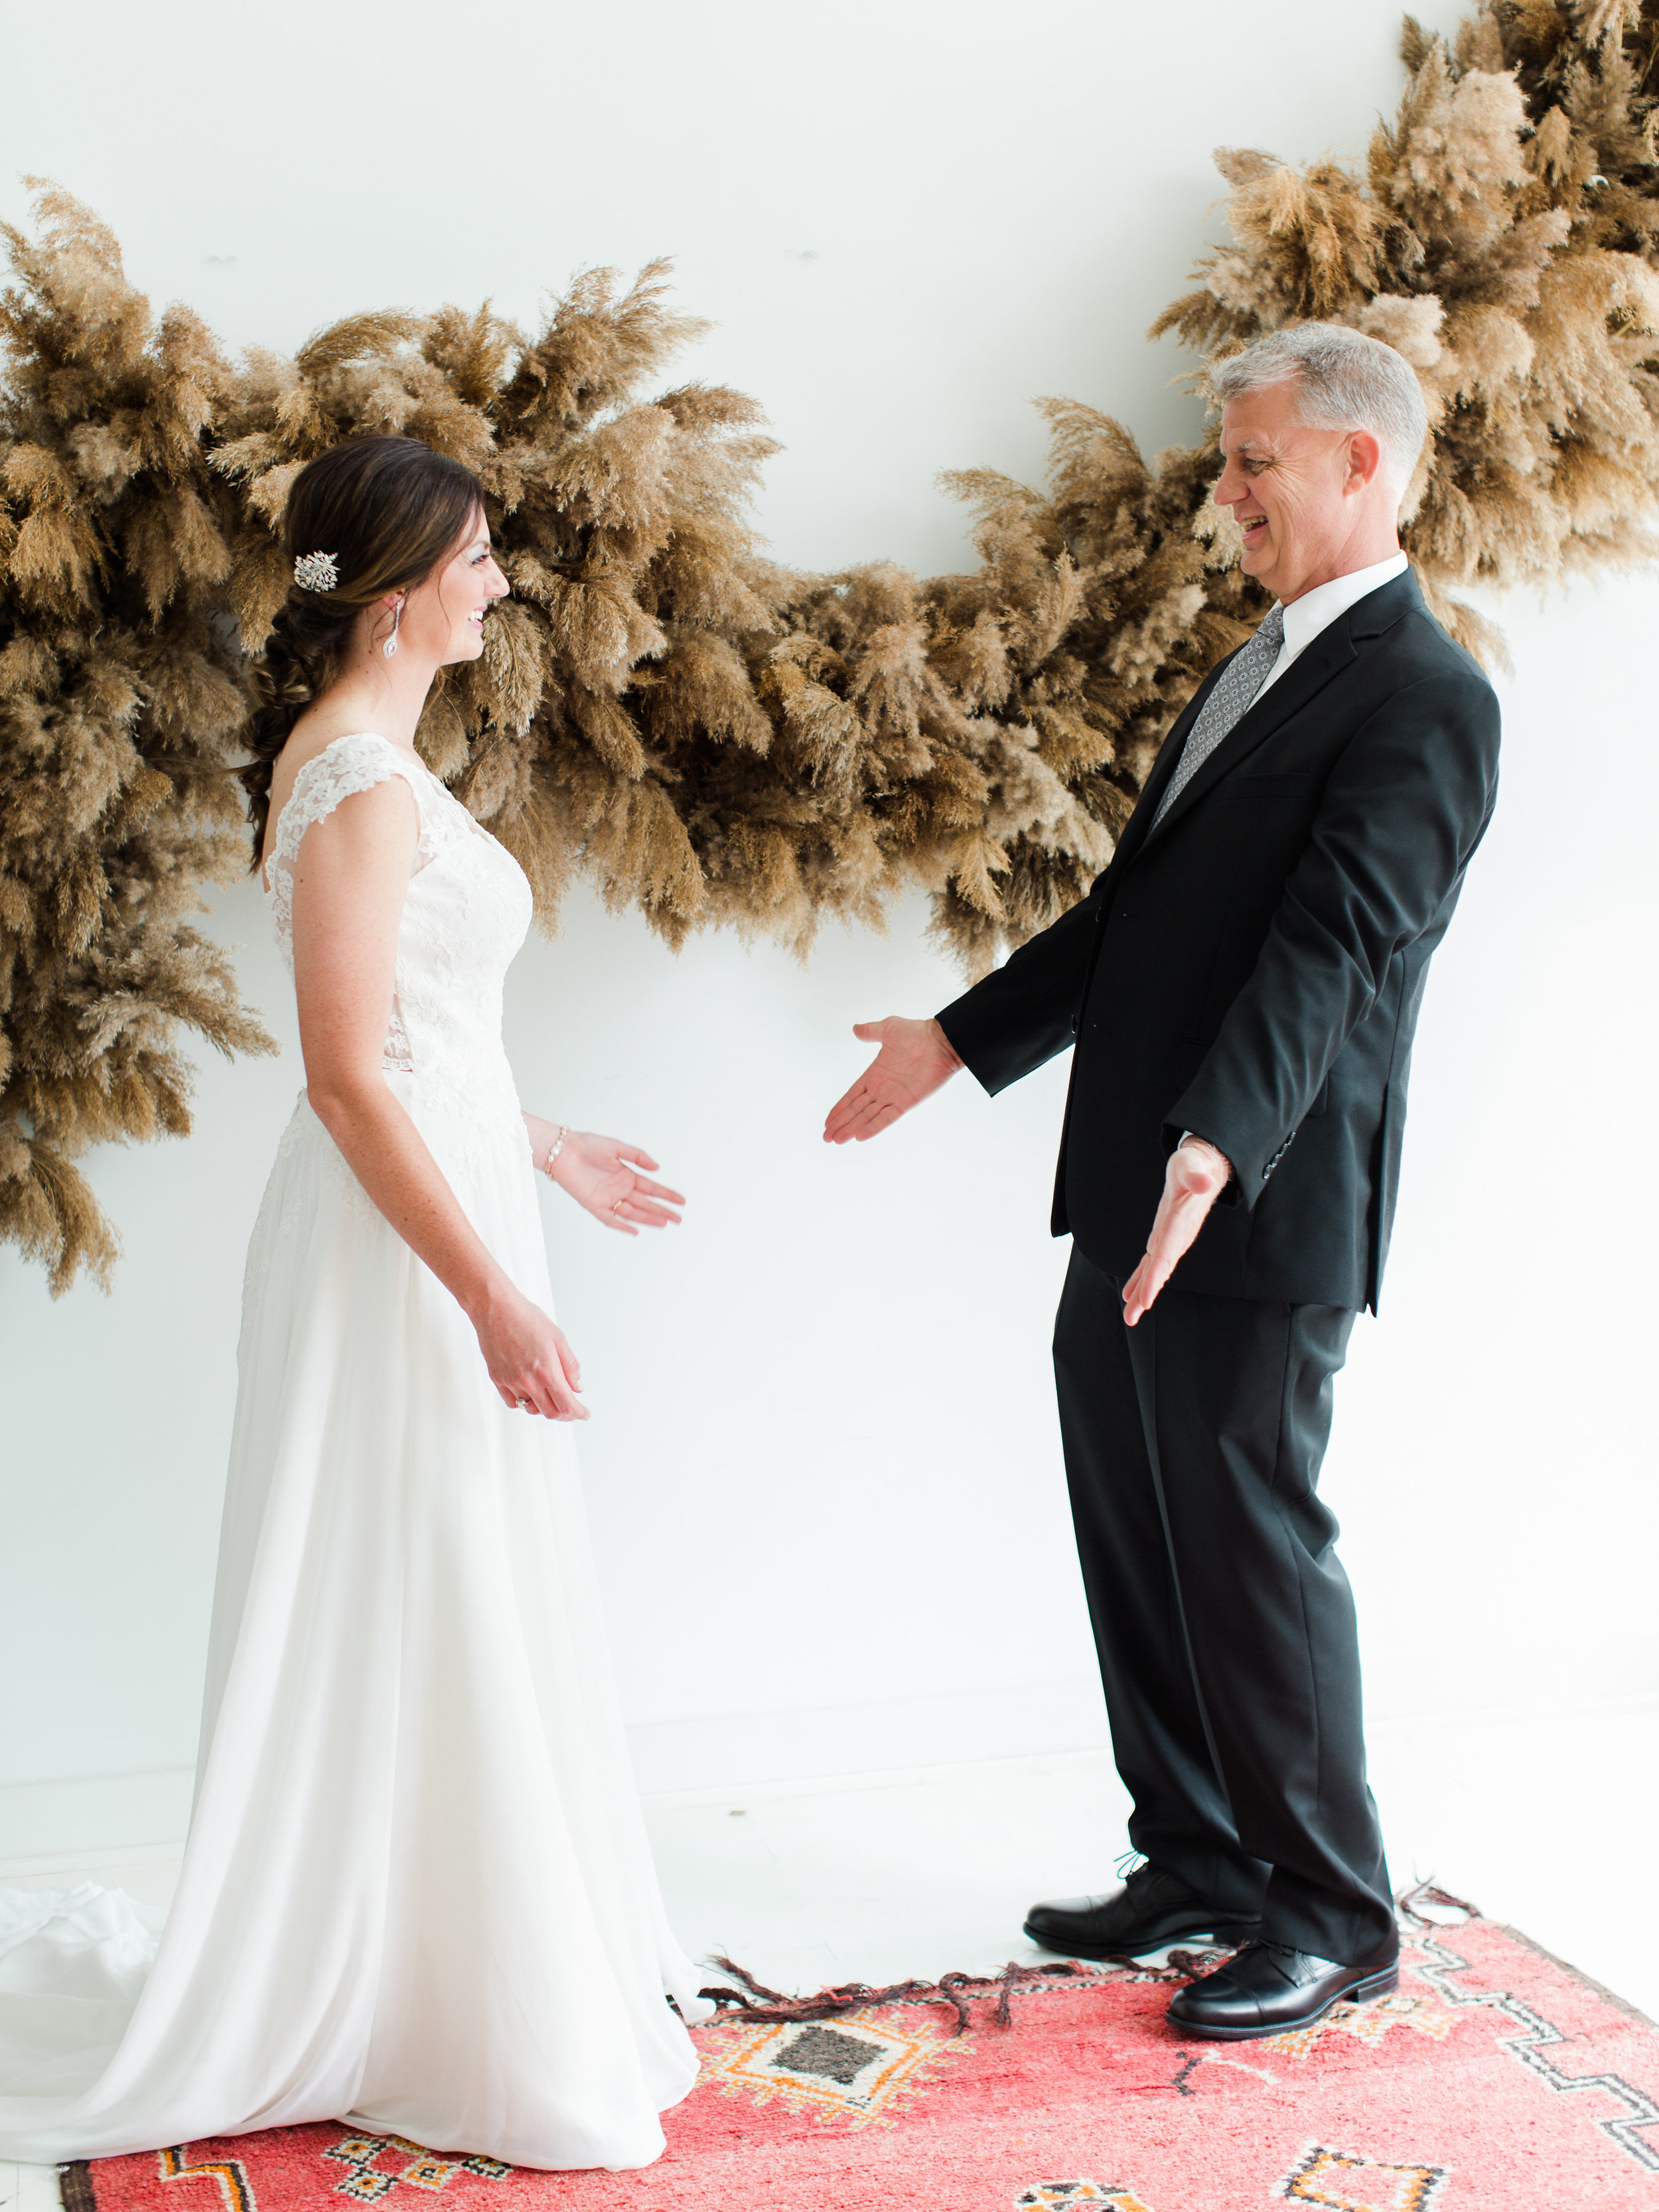 Julius+Wedding+FirstLook+Dad-3.jpg